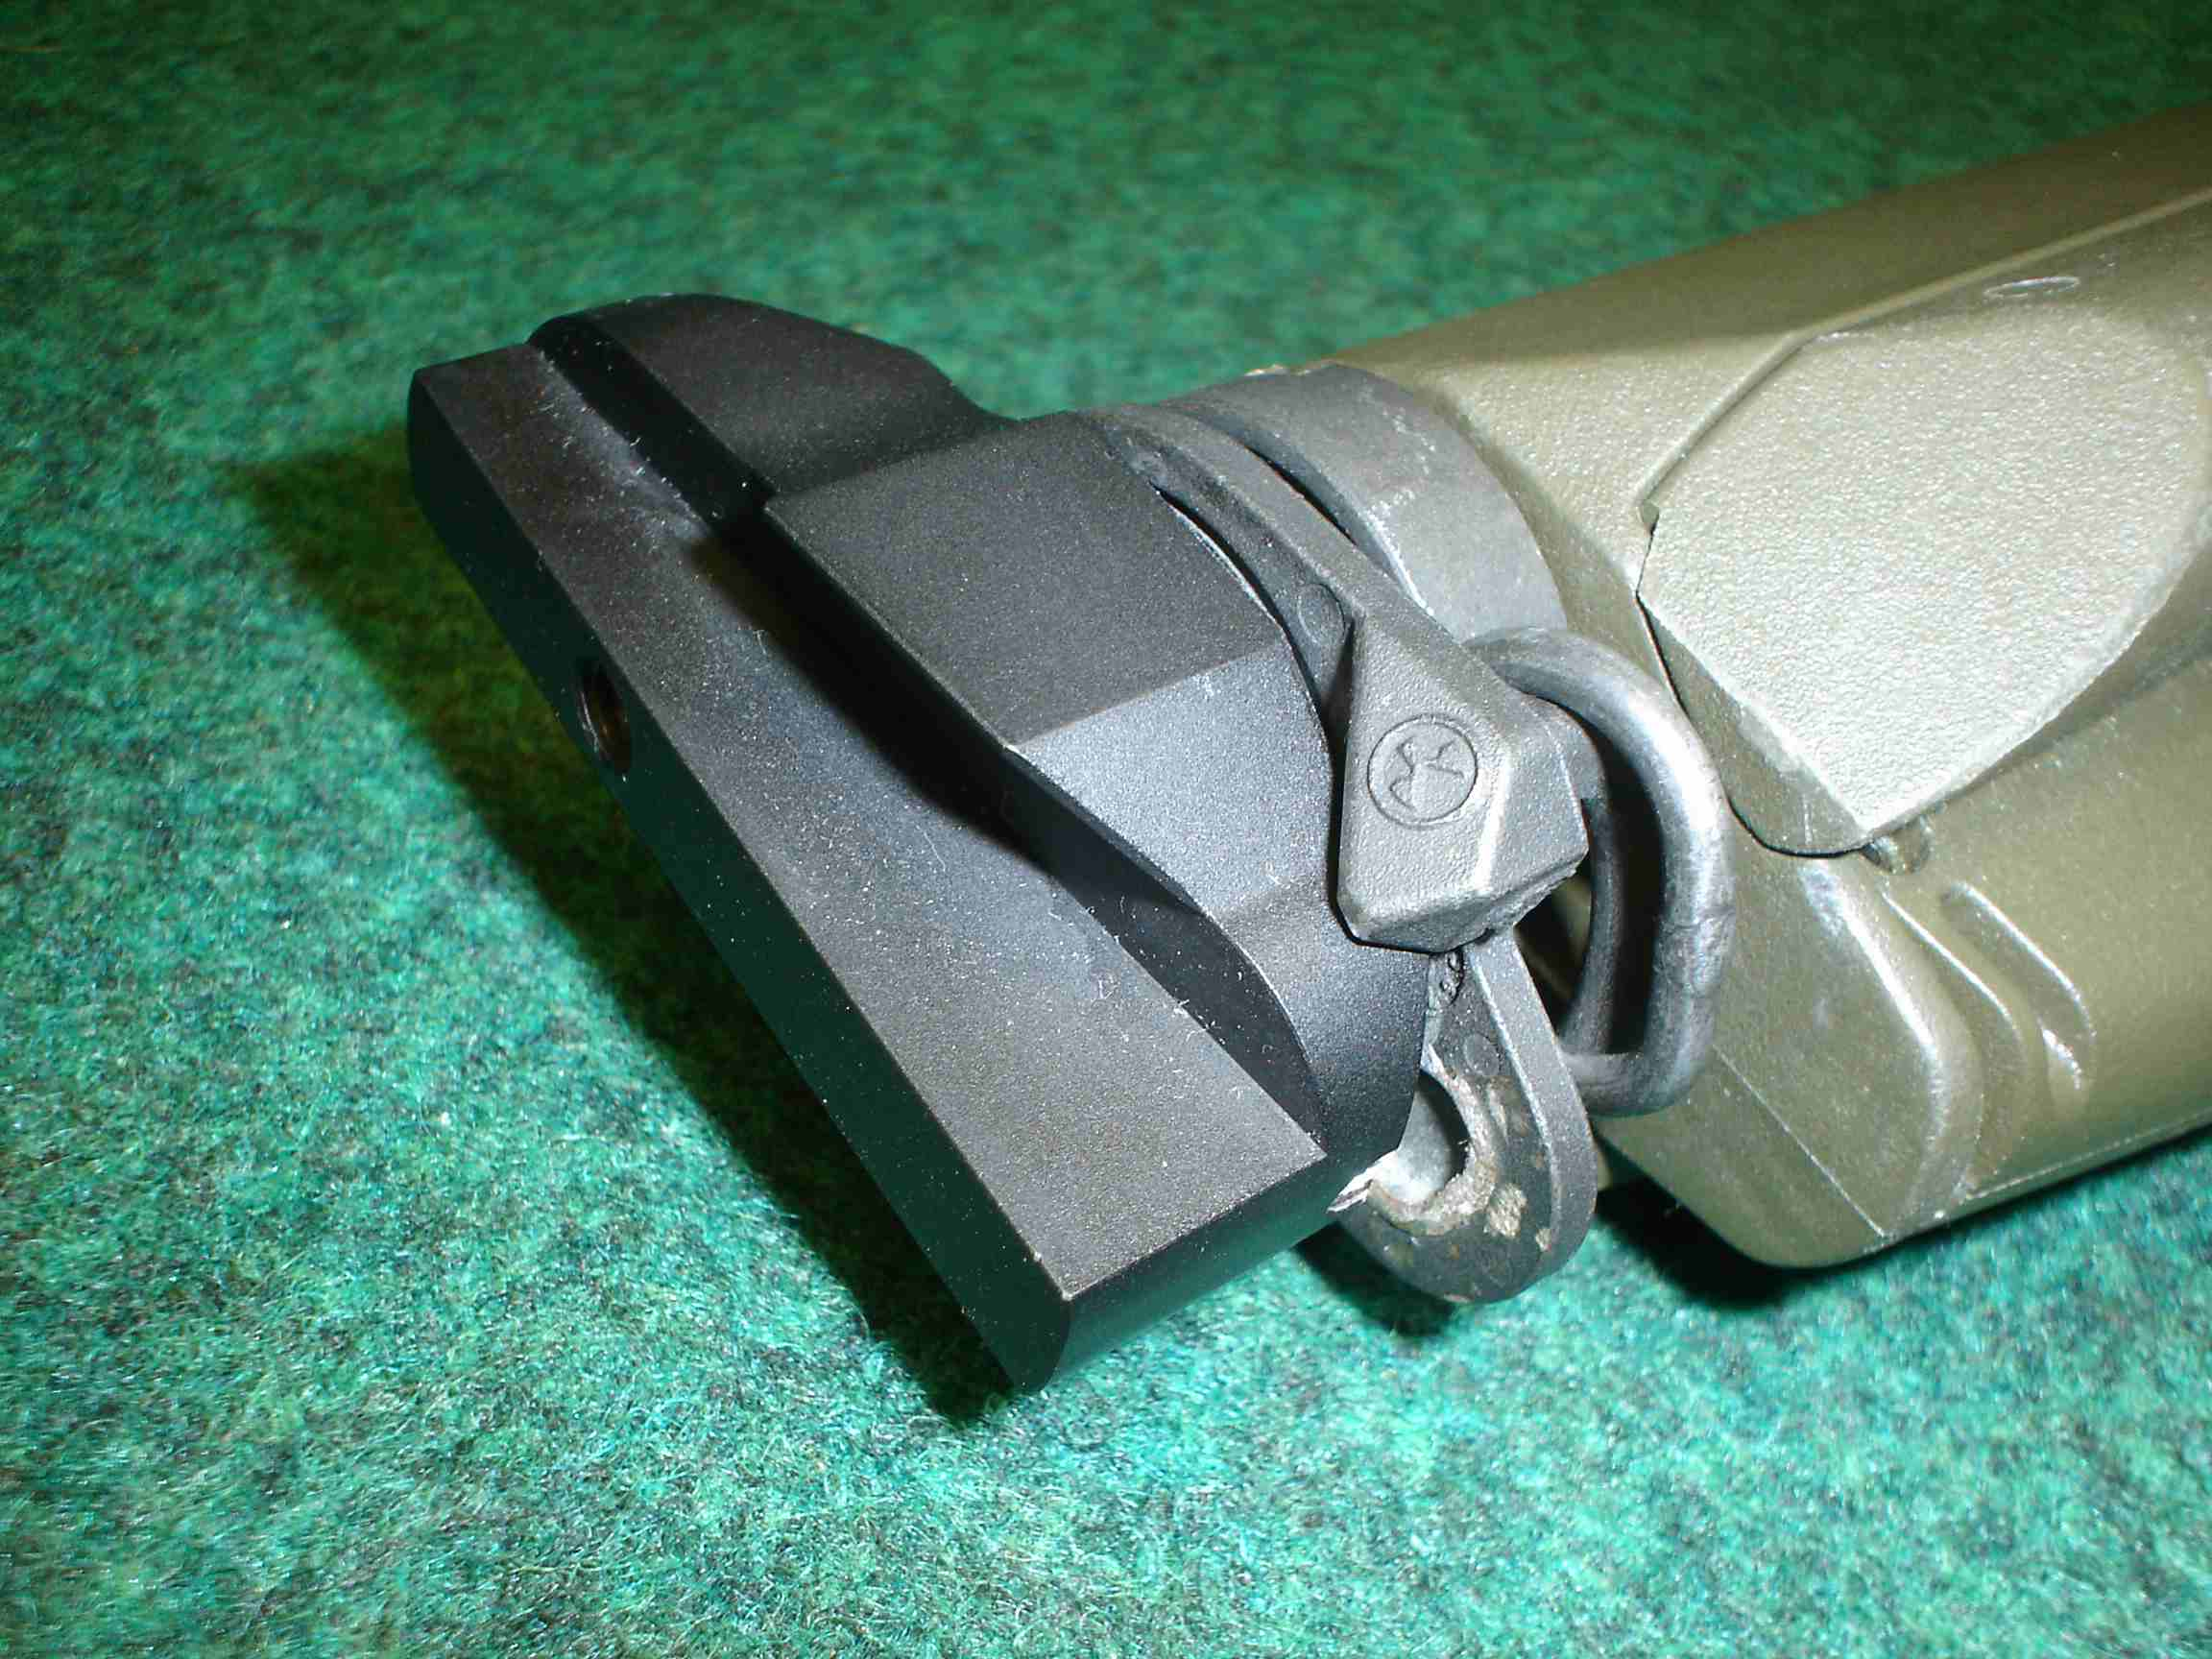 Robinson XCR m4 Stock Adapter & Olive Magpul ACS Stock-axcr2.jpg